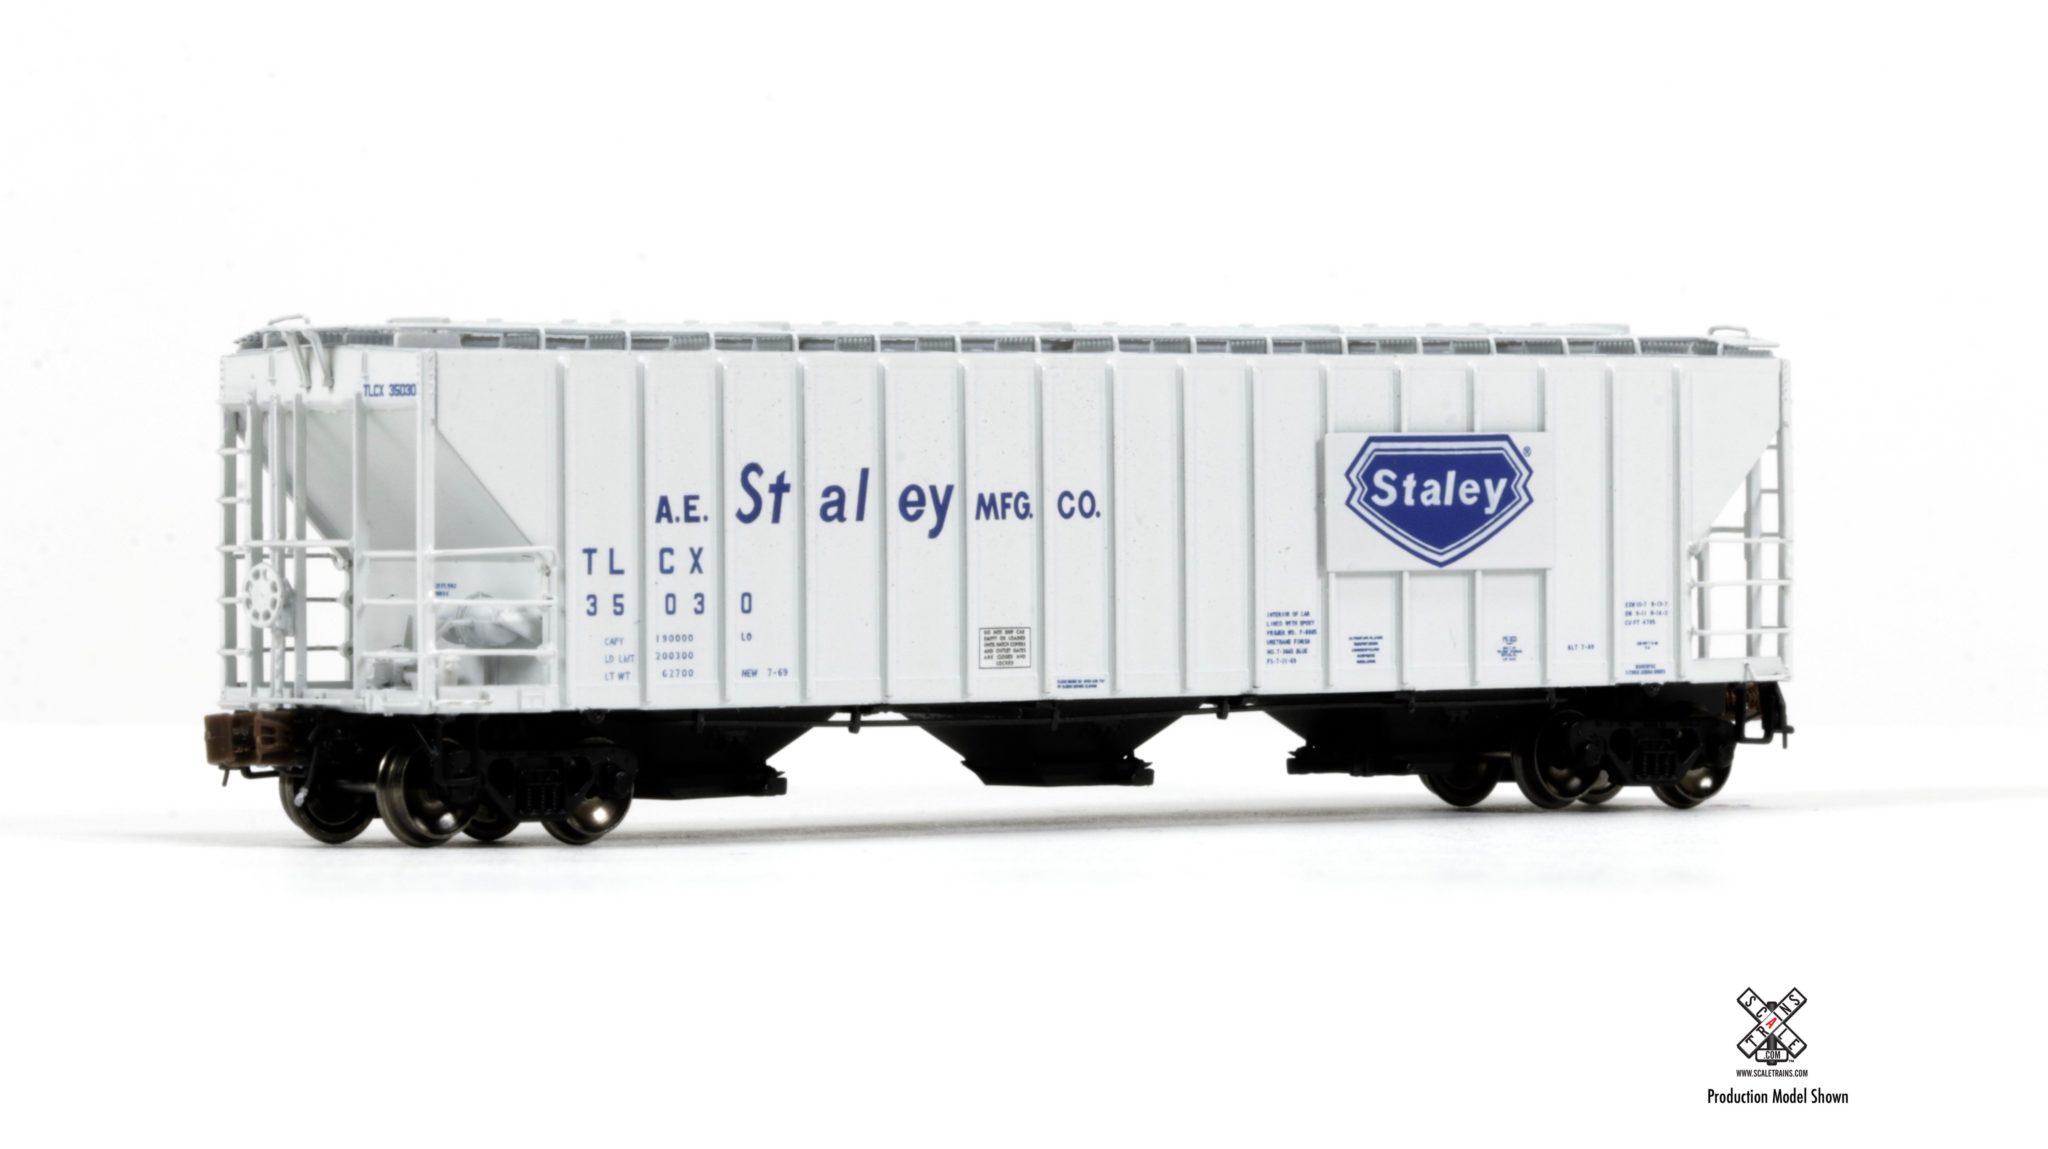 N Scale - ScaleTrains.com - SXT31051 - Covered Hopper, 3-Bay, PS-2 - A.E. Staley - 35114